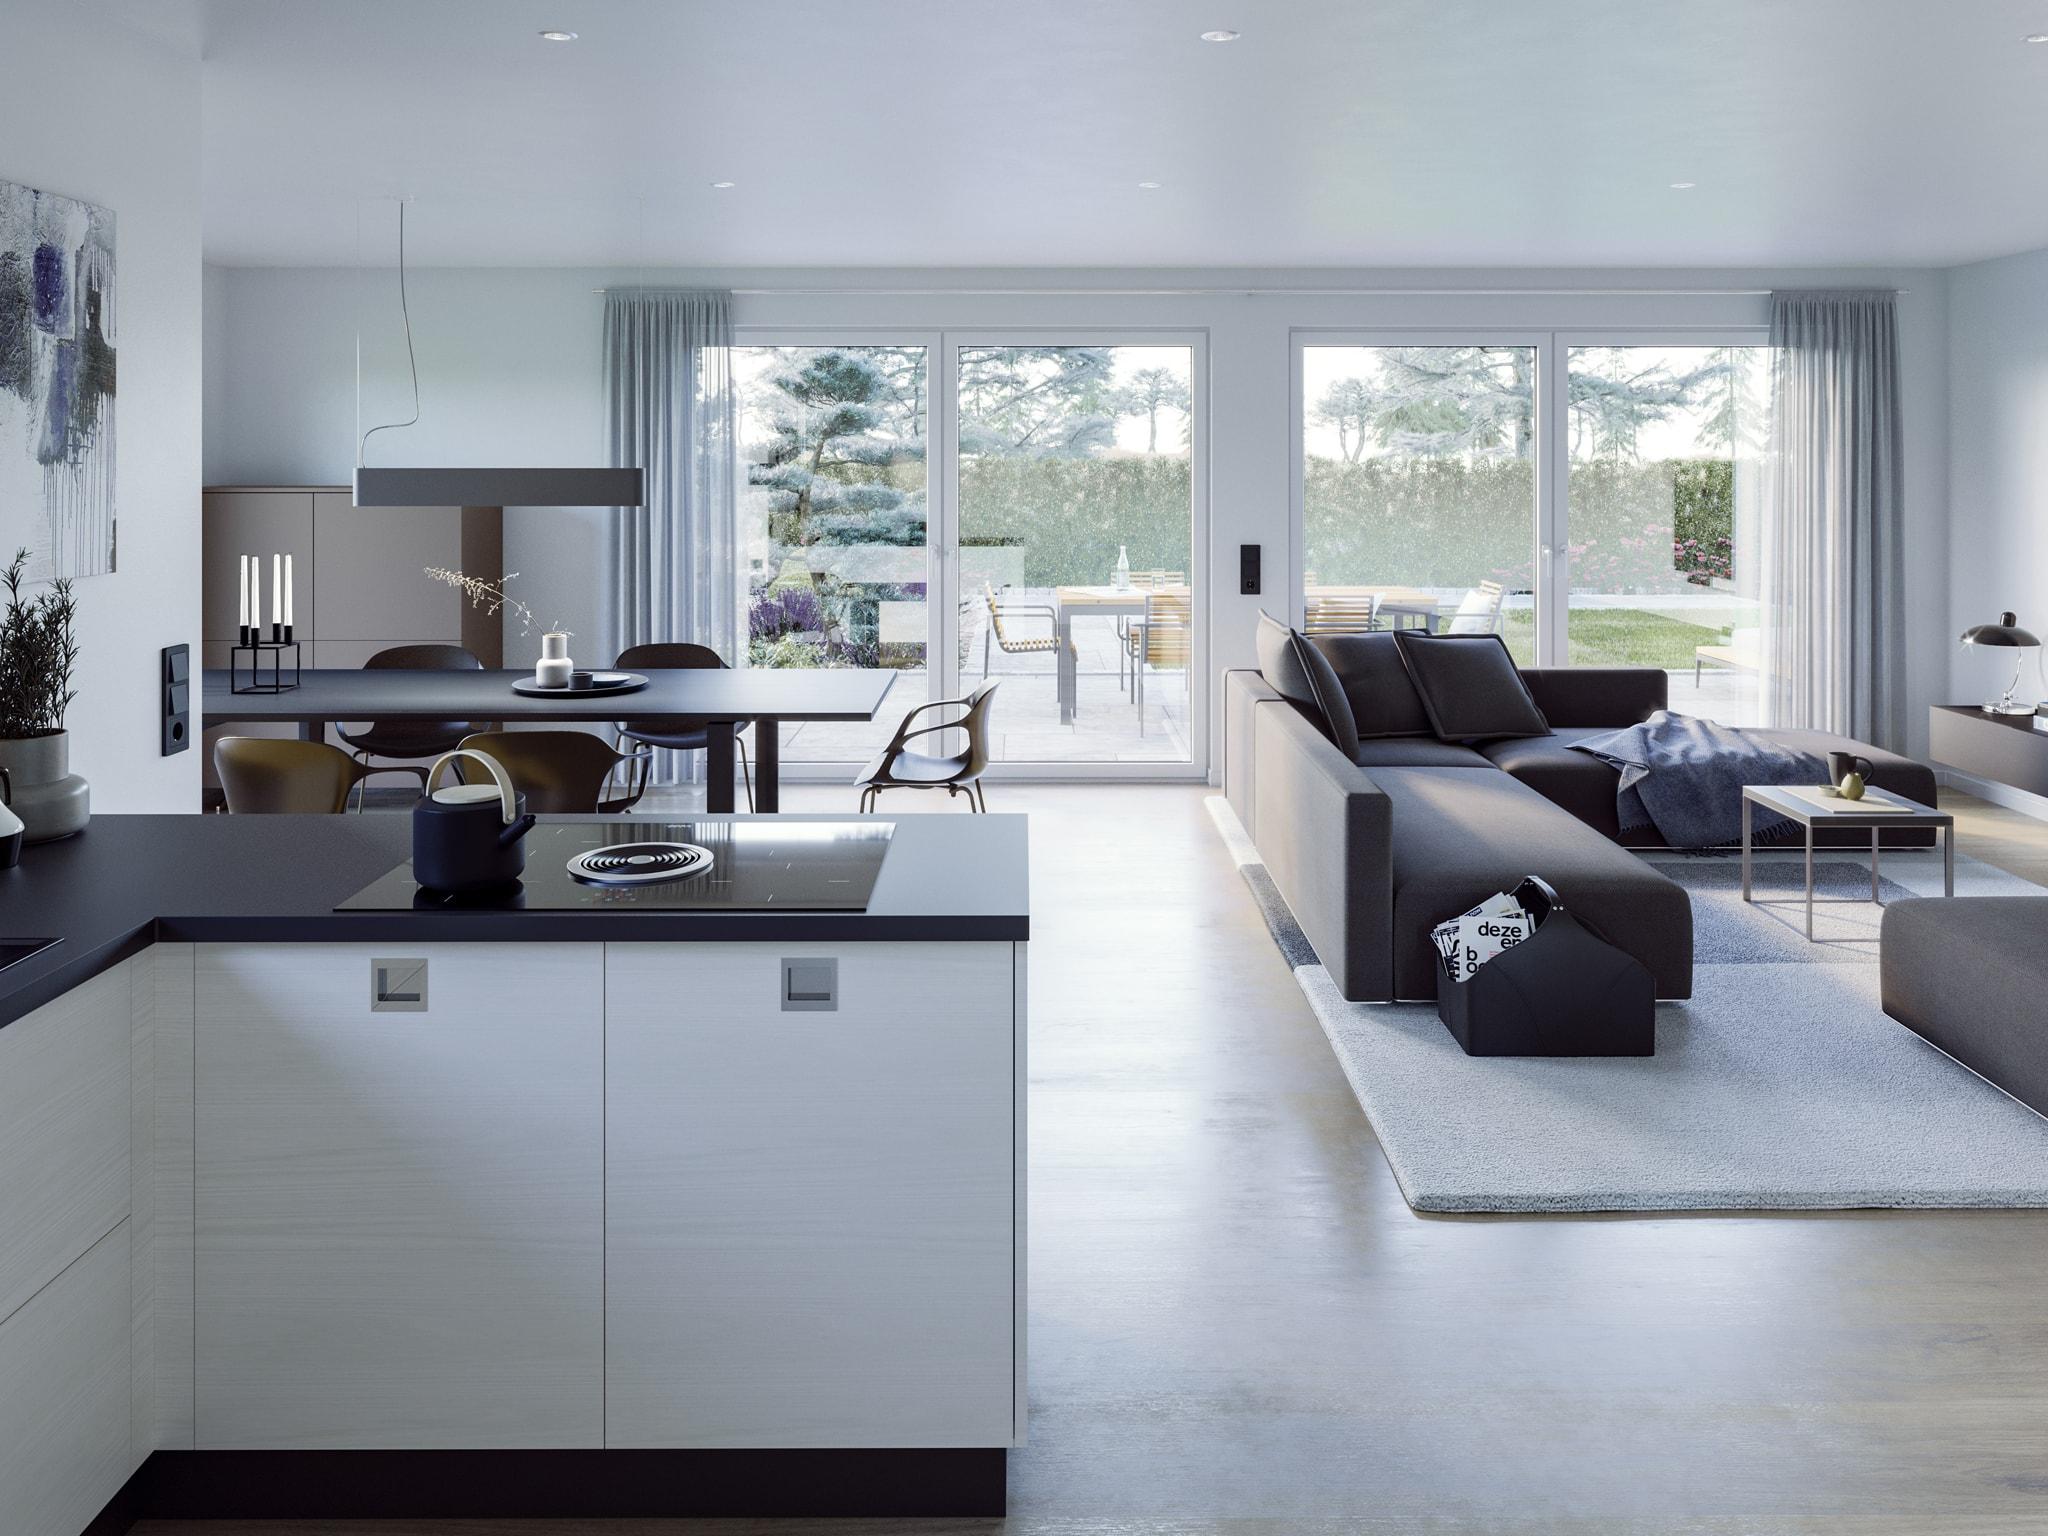 Wohnzimmer Kueche Esstisch Inneneinrichtung Ideen Bunbalow AMBIENCE 77 V3 Bien Zenker Haus - HausbauDirekt.de